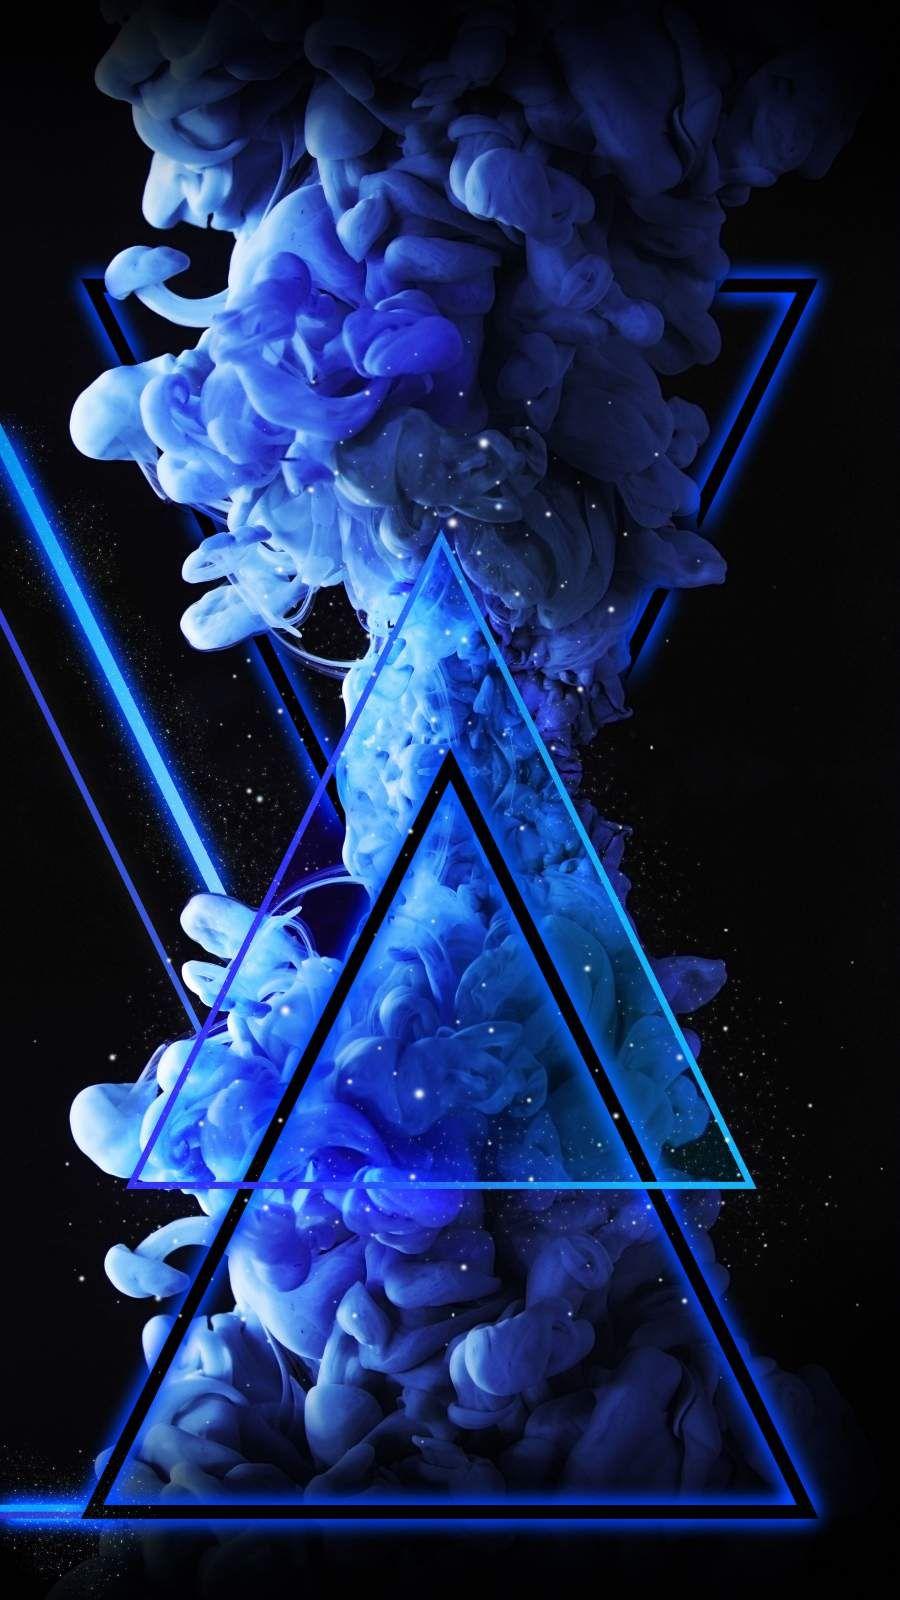 Blue Triangle Neon Smoke Bomb with 900x1600 Resolution